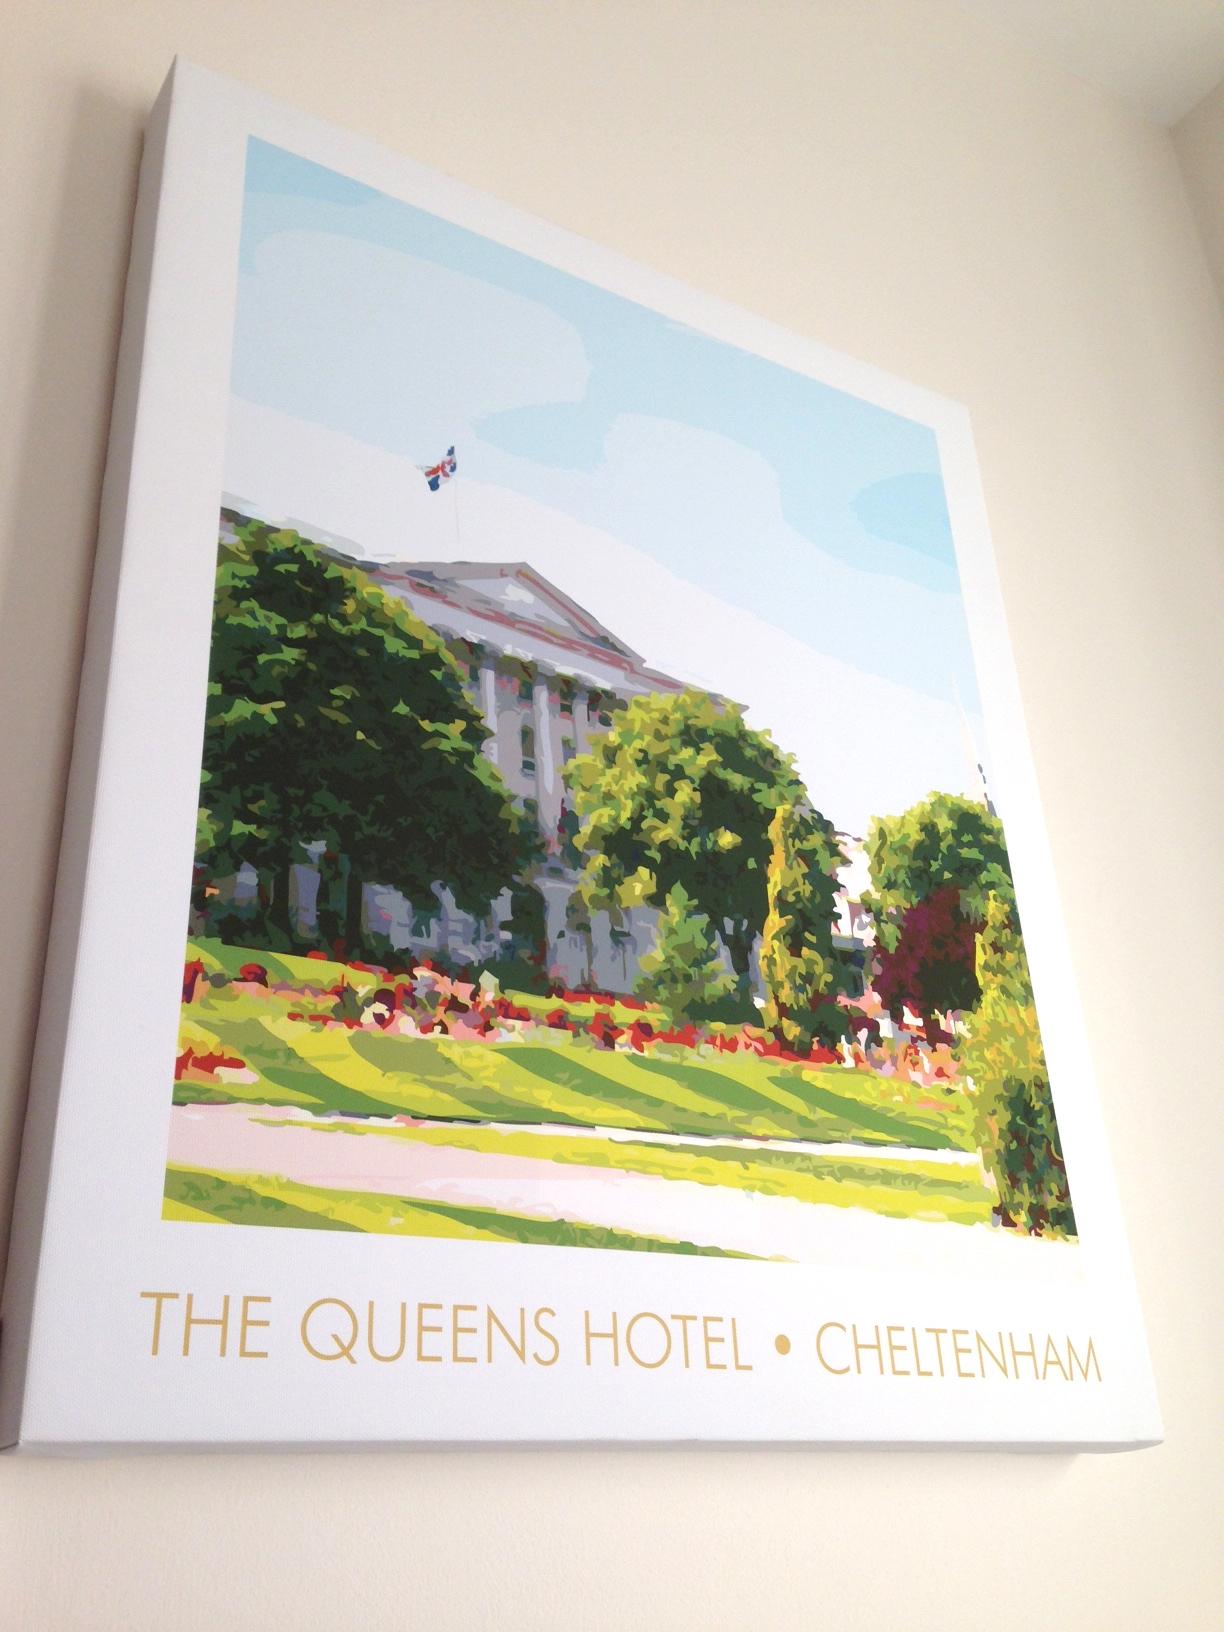 The Queens Hotel, Cheltenham canvas